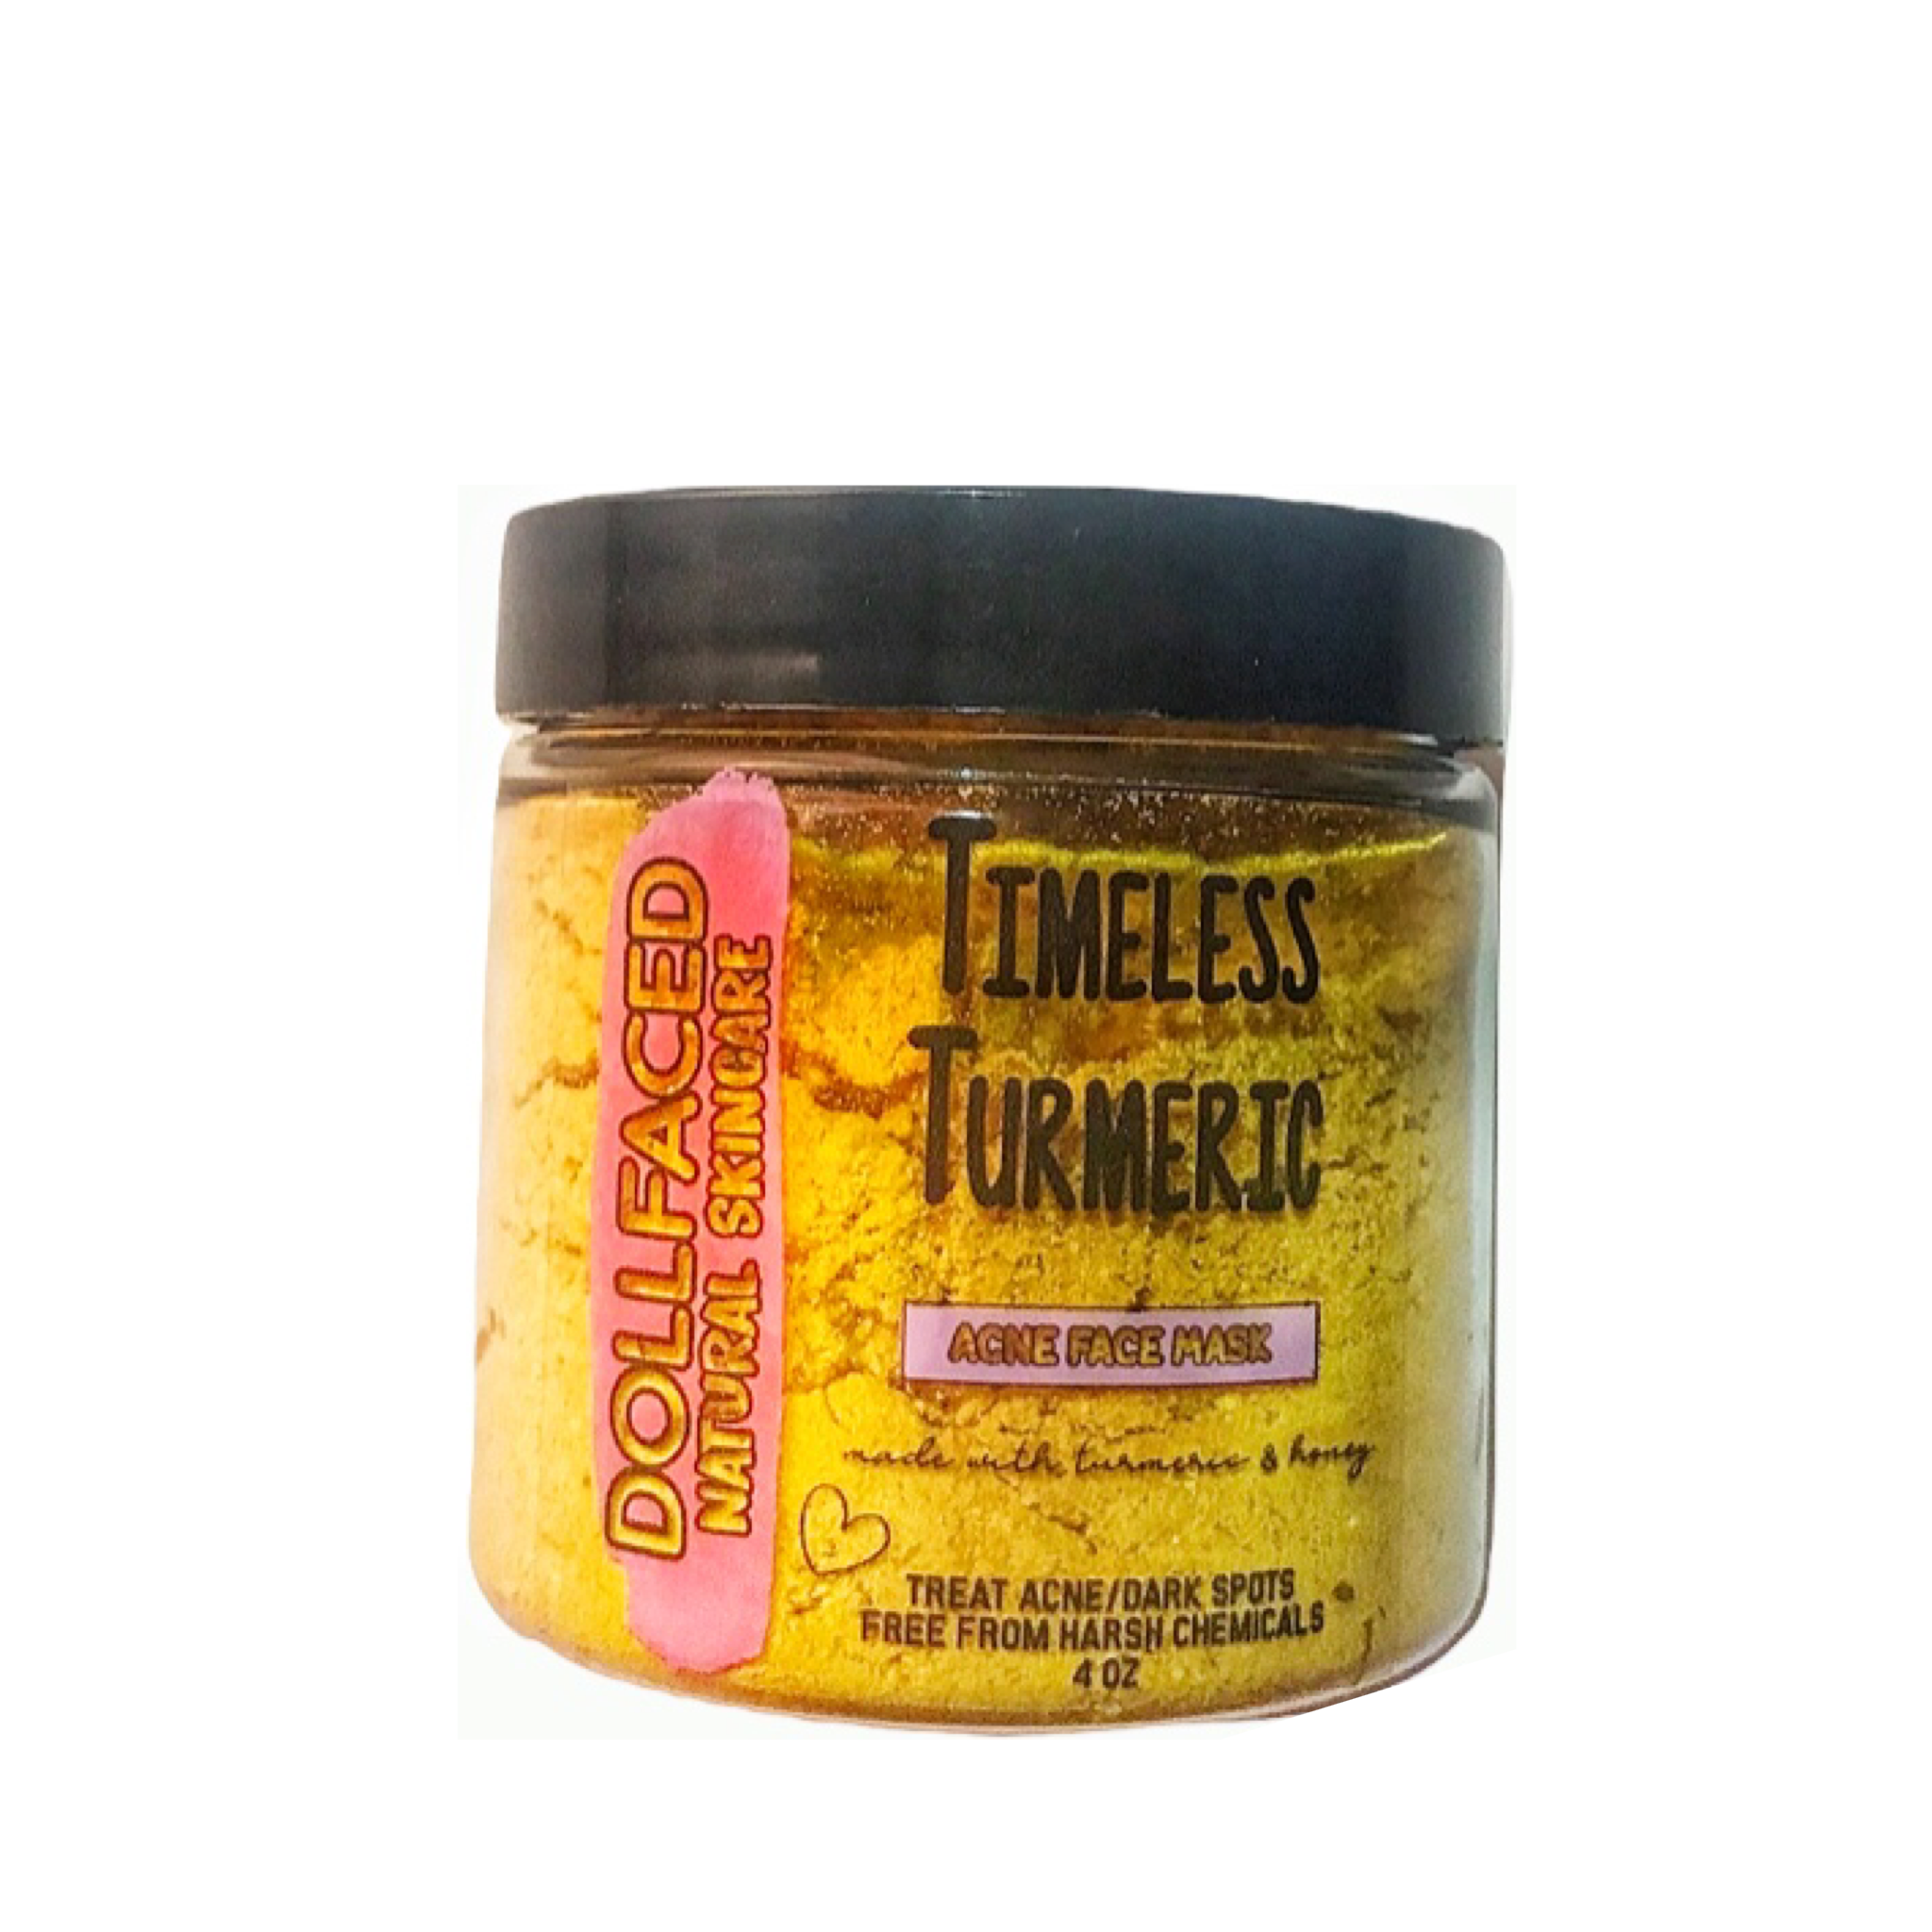 Dollfaced Natural Skincare - Timeless Turmeric Mask